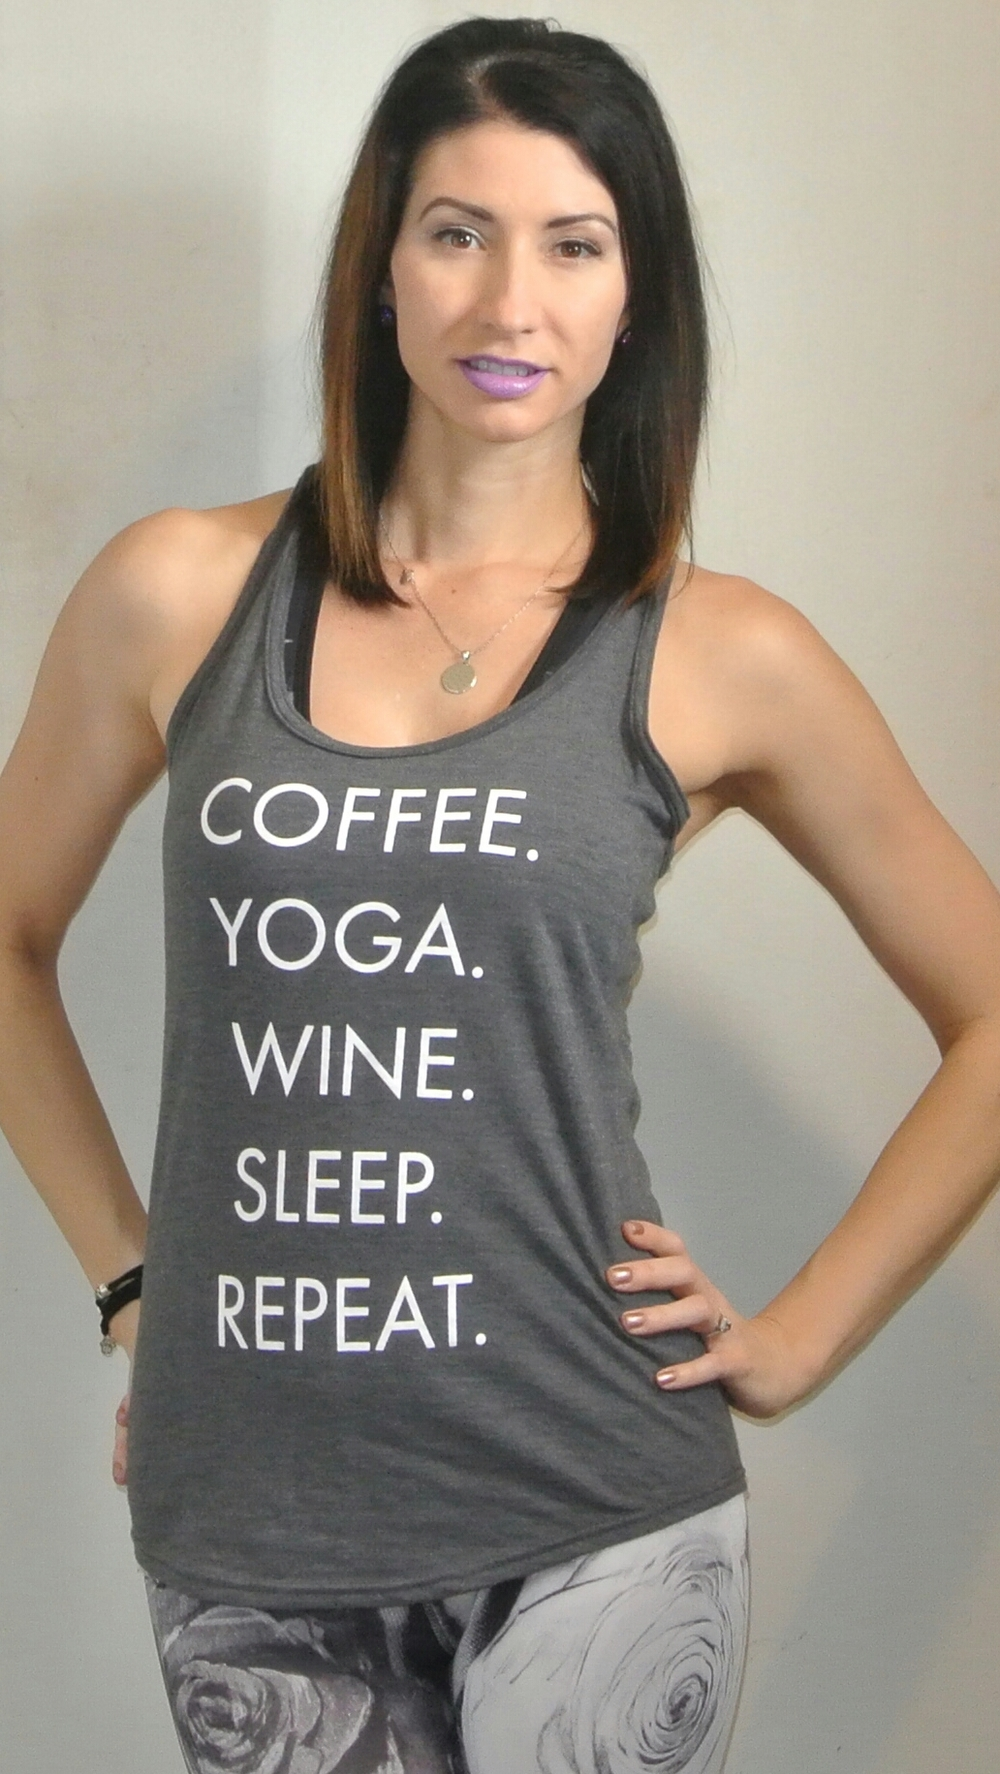 coffeeyogawinedarkgraytank.jpg